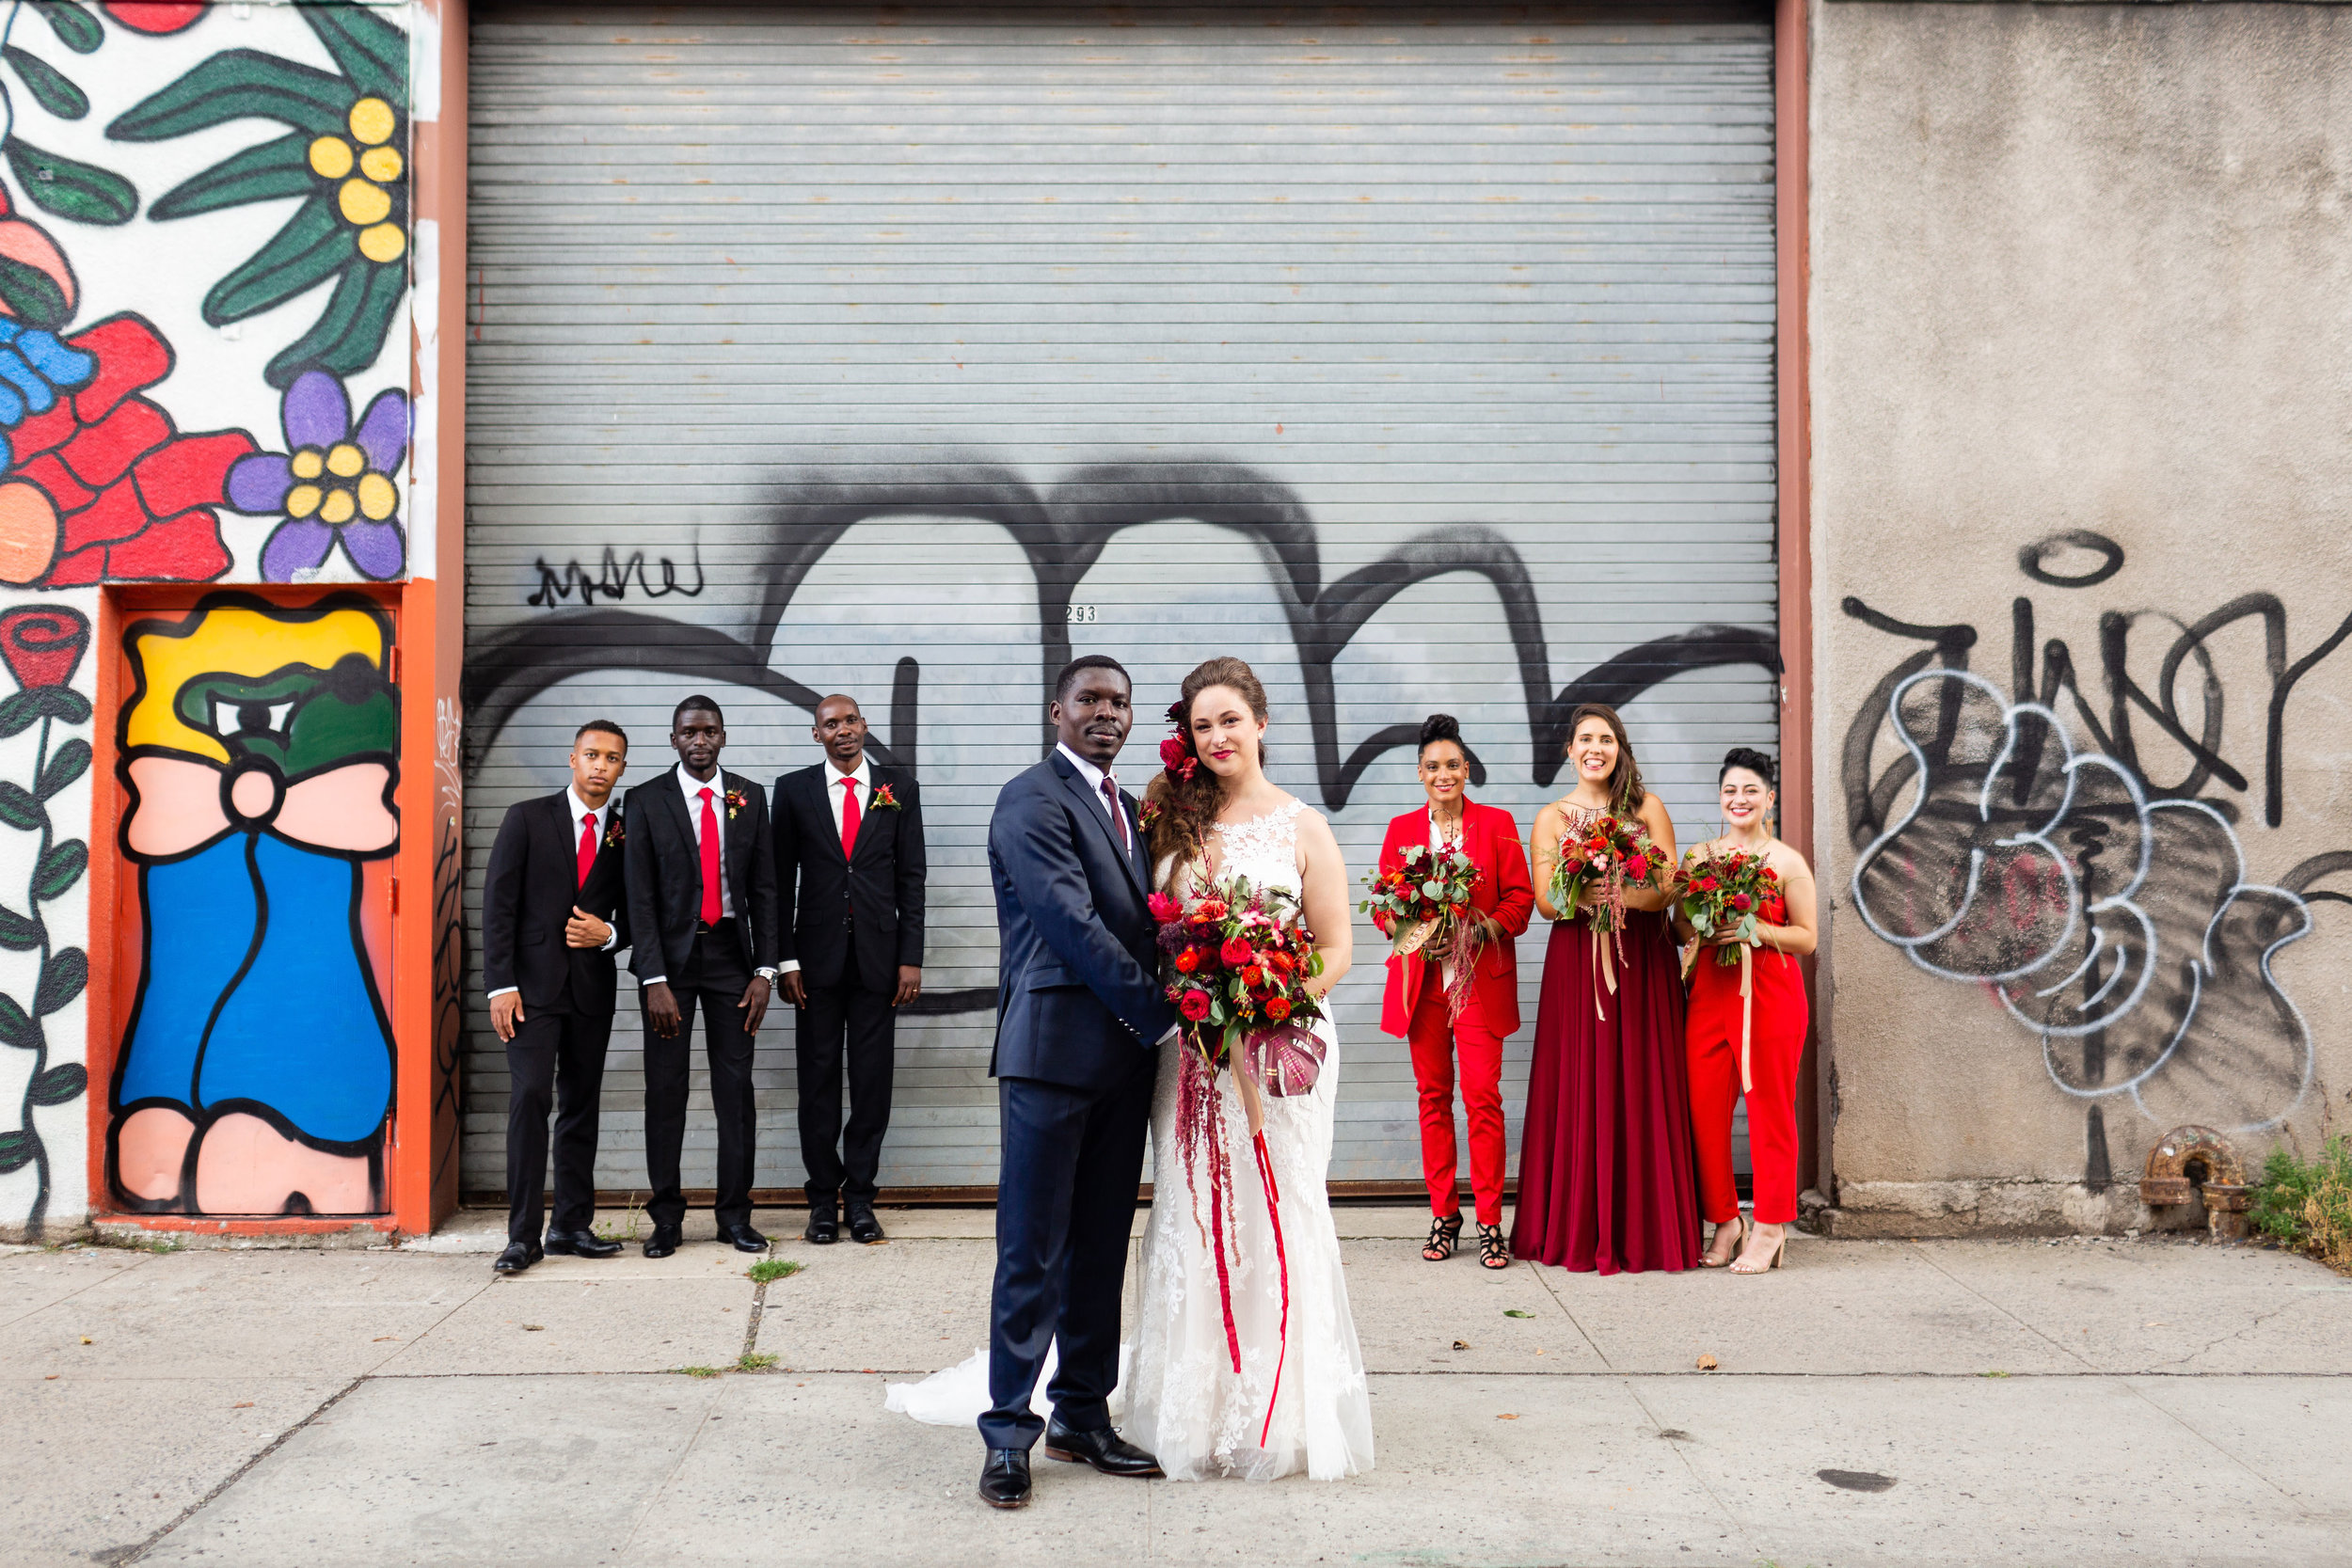 Elizabeth_Joab_multicultural_wedding_Petronella_Photography_438.jpg